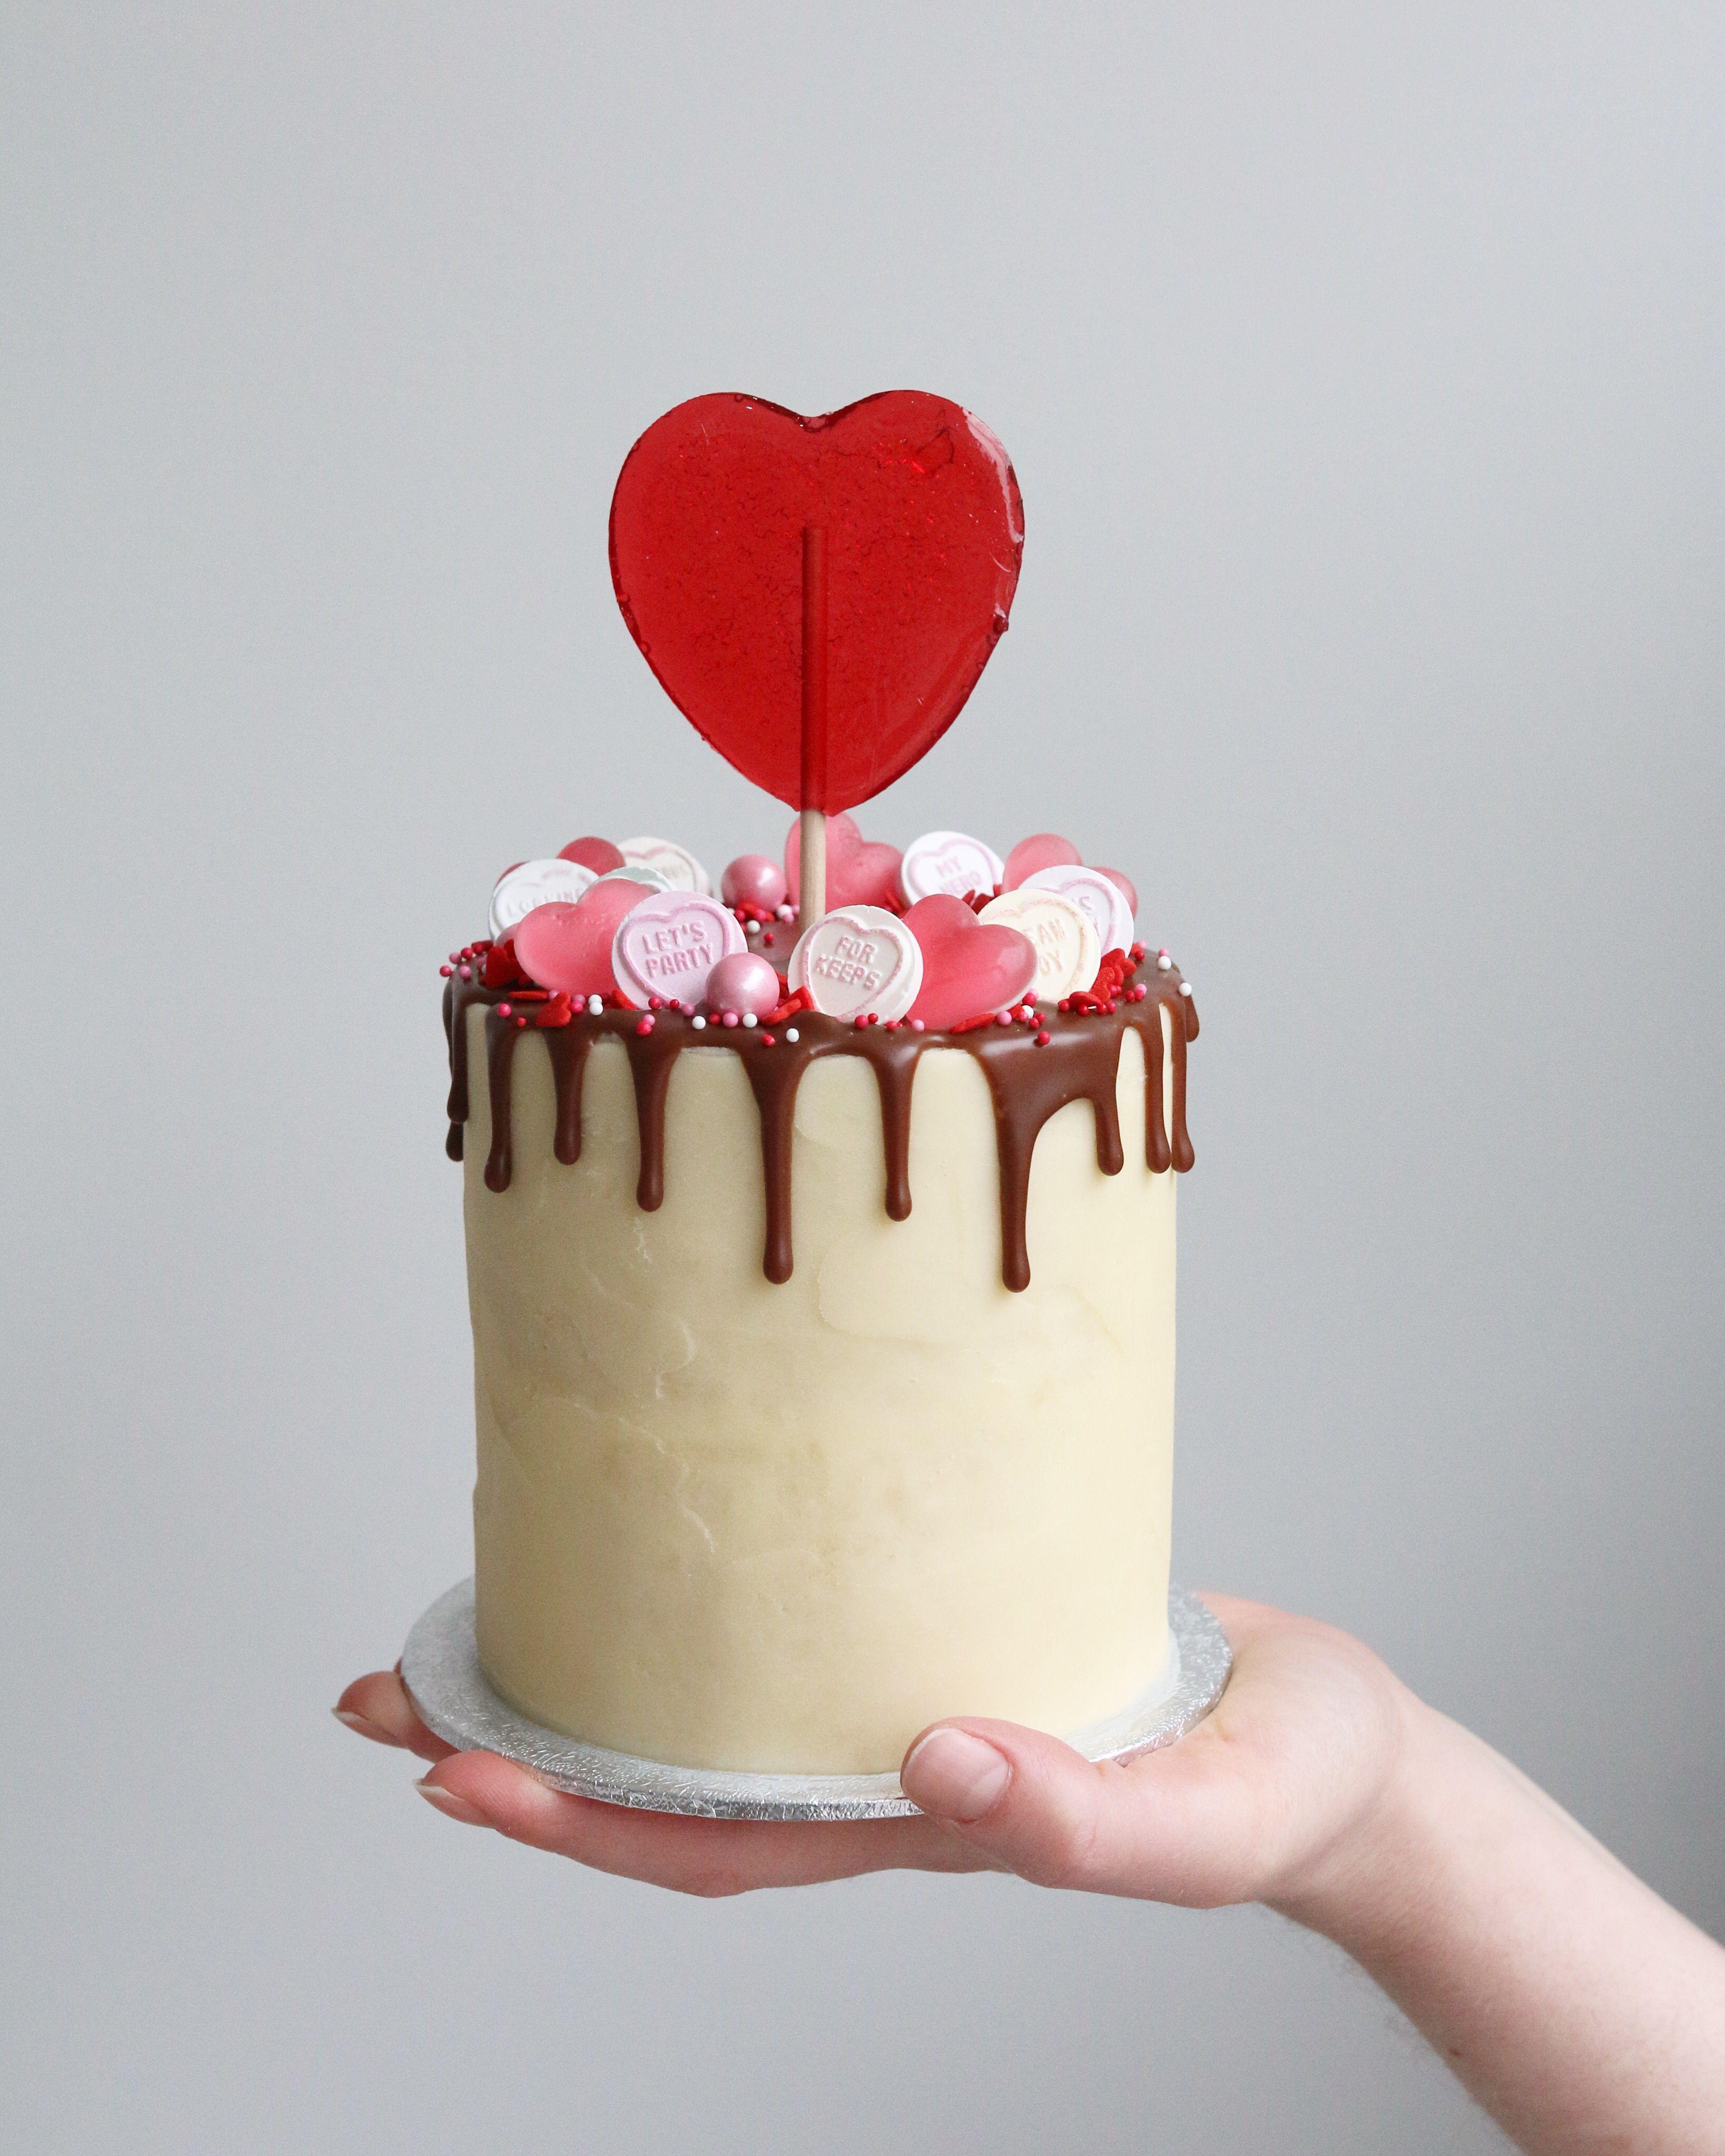 Mini Valentine's Sweetie Drip Cake | Drip cakes, Mini valentine cakes, Valentines day cakes